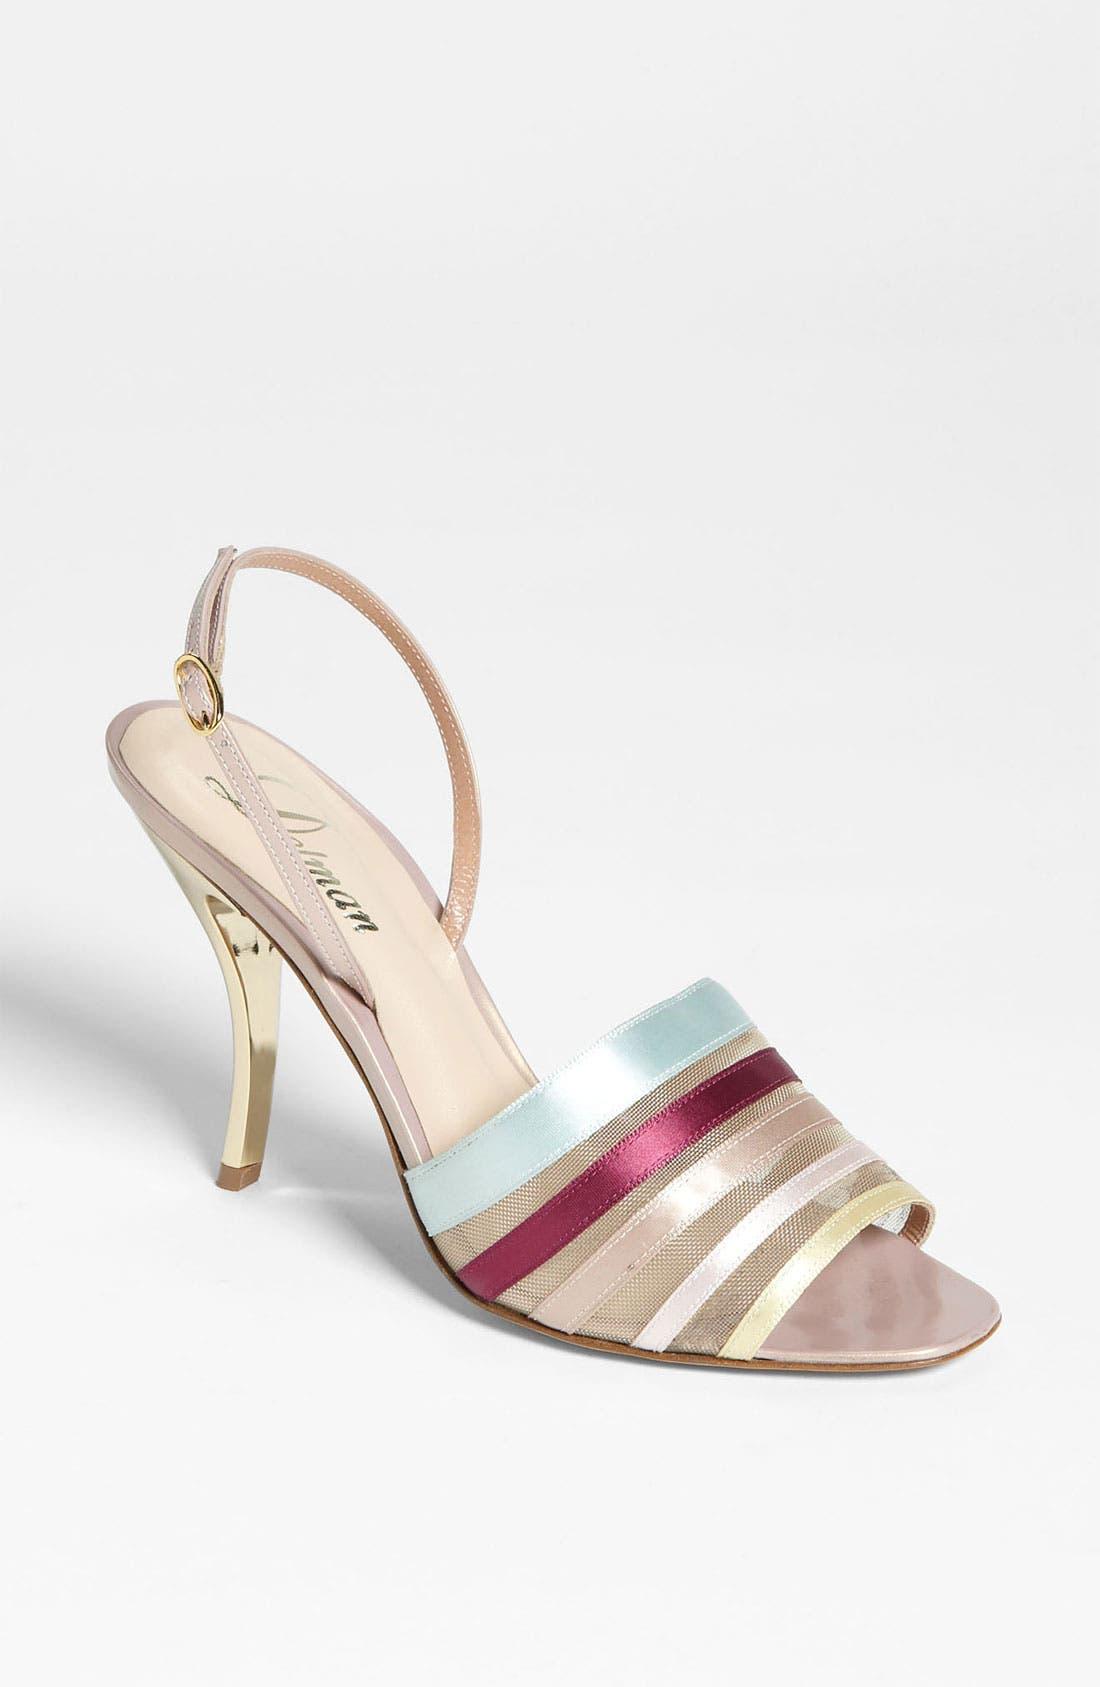 Alternate Image 1 Selected - Delman 'Adora' Sandal